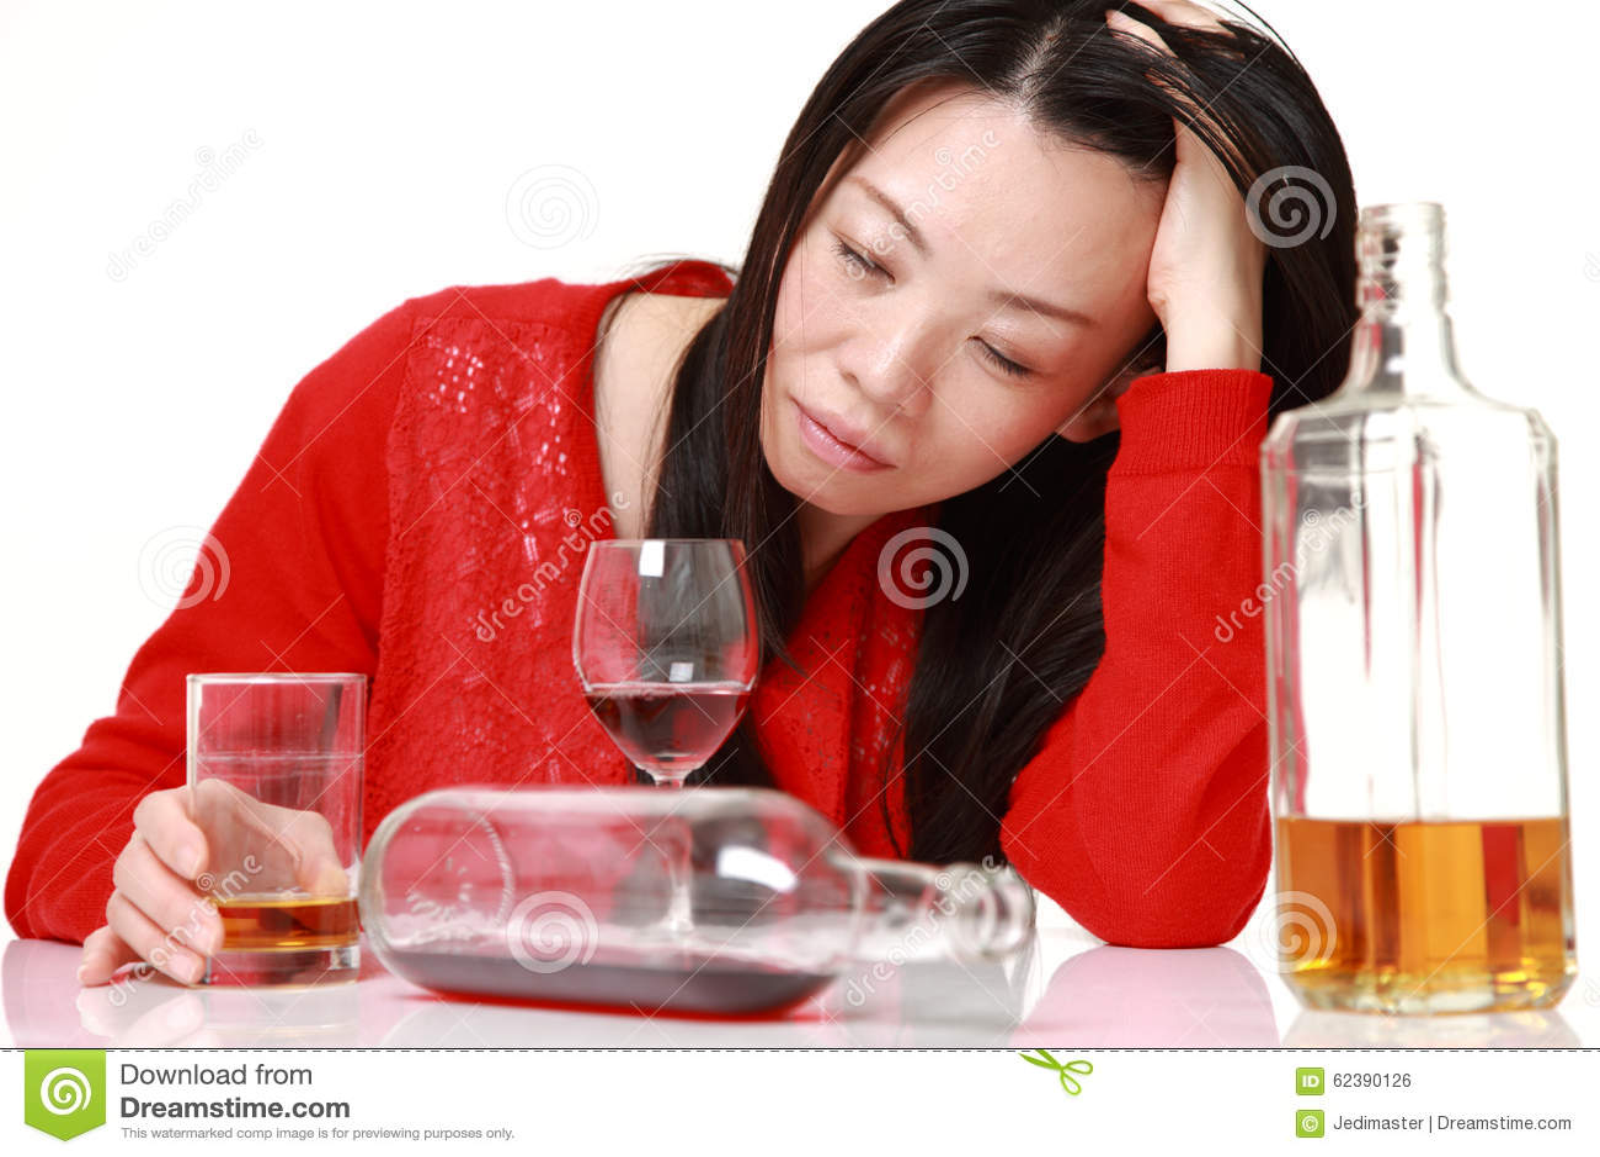 depressie en alcohol